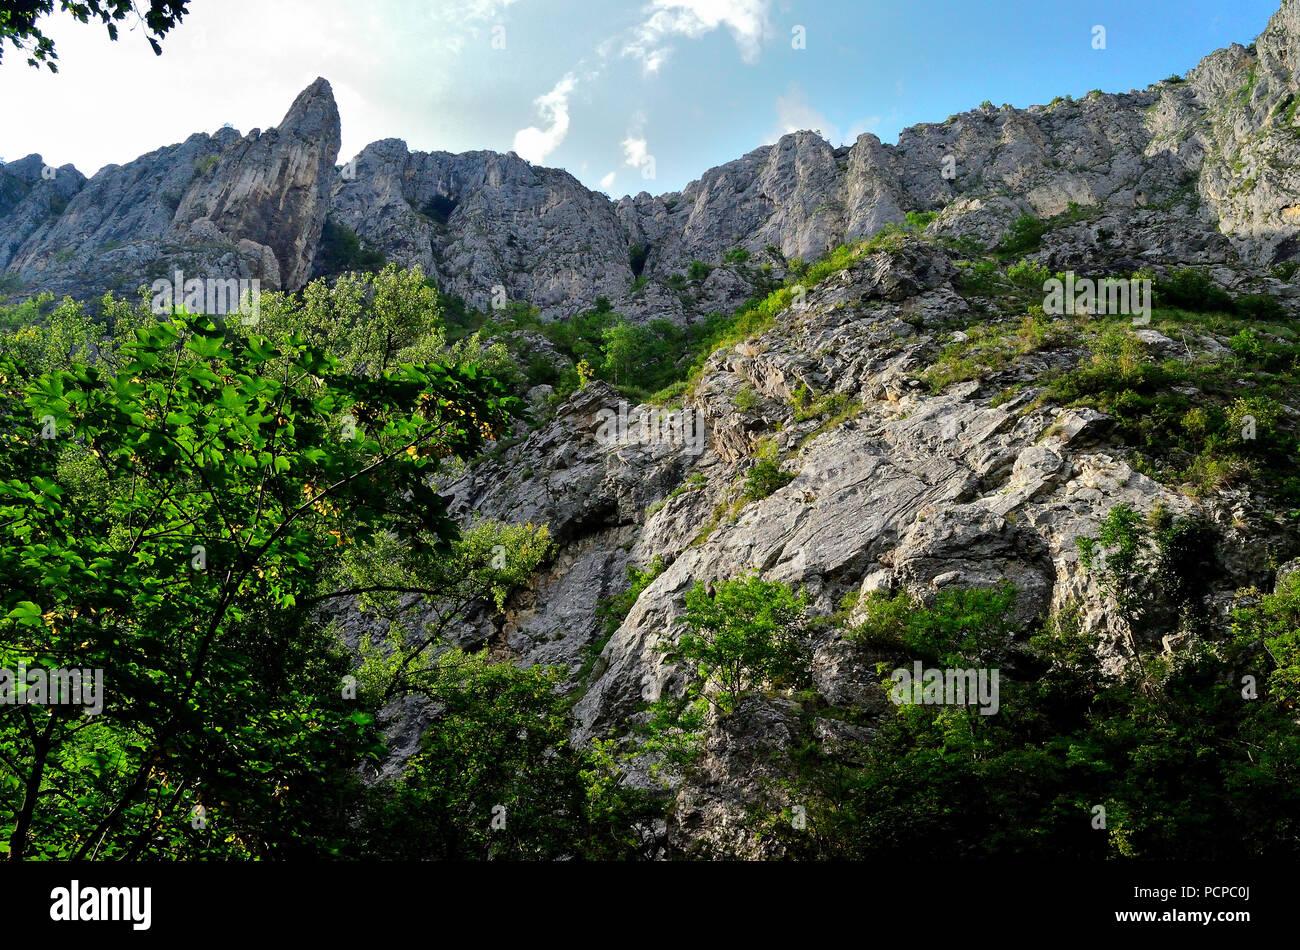 Big Mountains of Turda, The Cheile Turzii - Stock Image